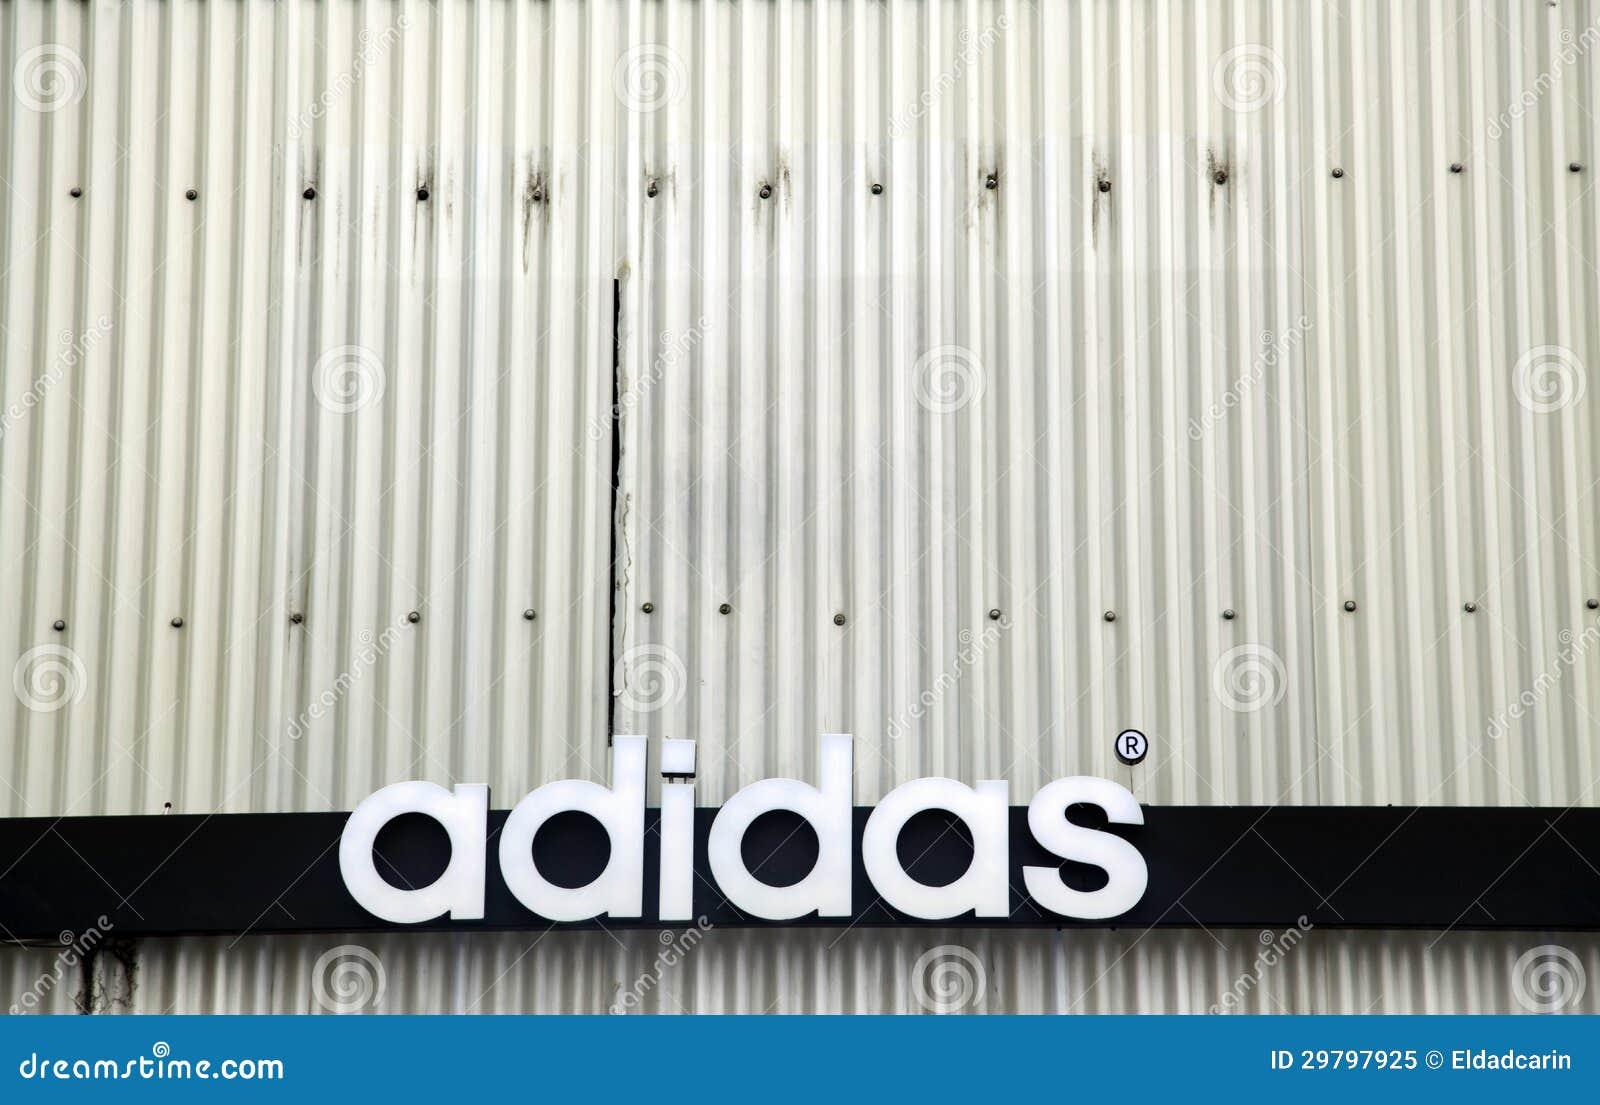 Adidas Grunge editorial image  Image of modern, winter